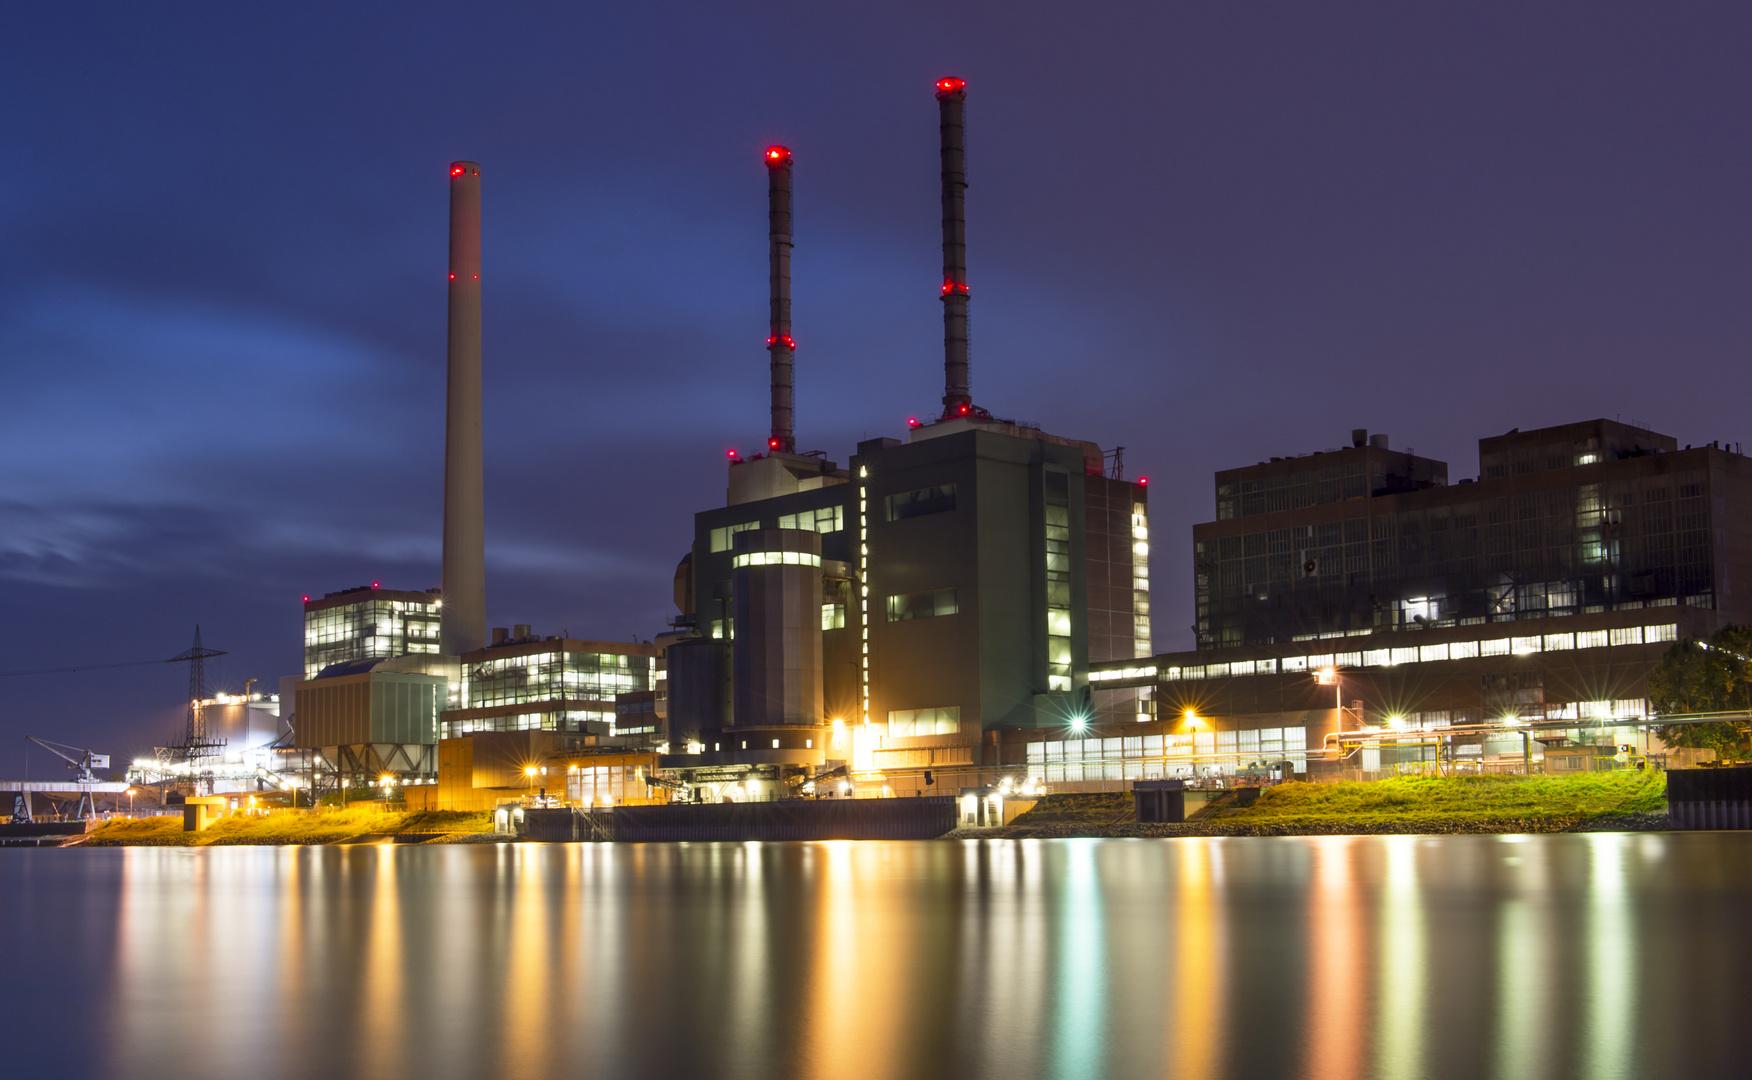 Kohlekraftwerk Mannheim Bild 3, August 2013